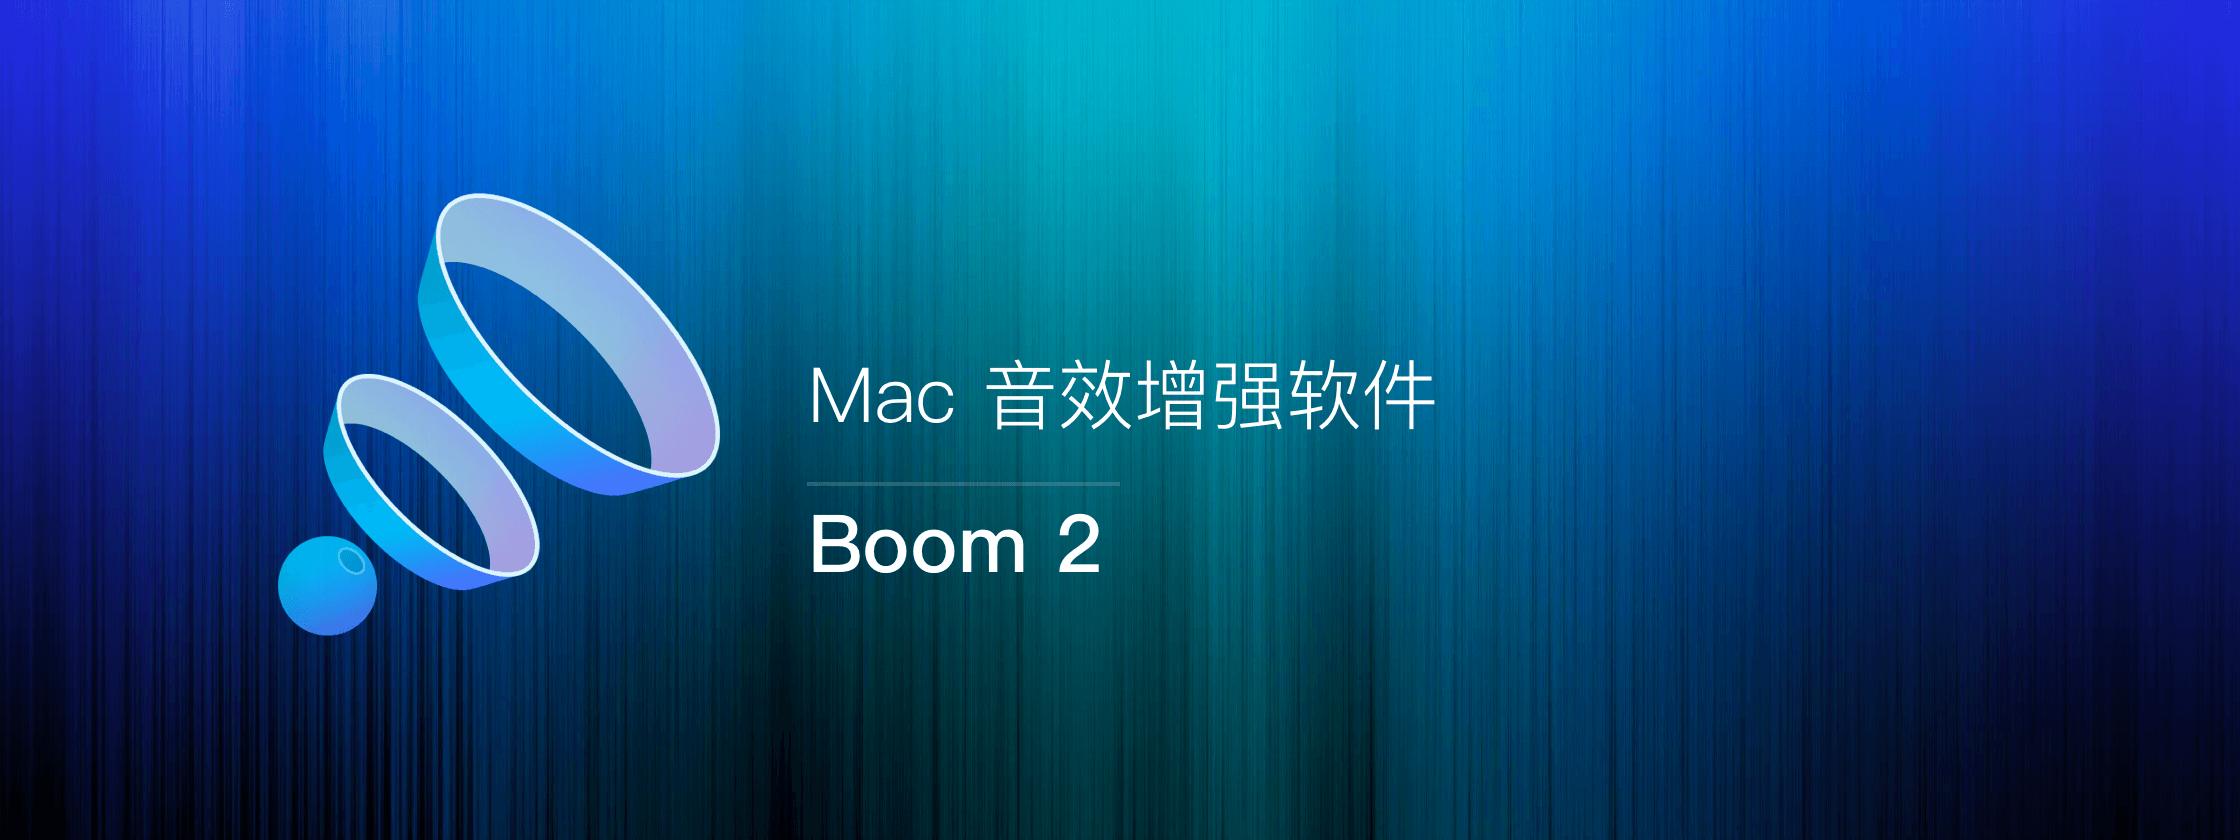 Boom 2 – Mac 音效增强软件